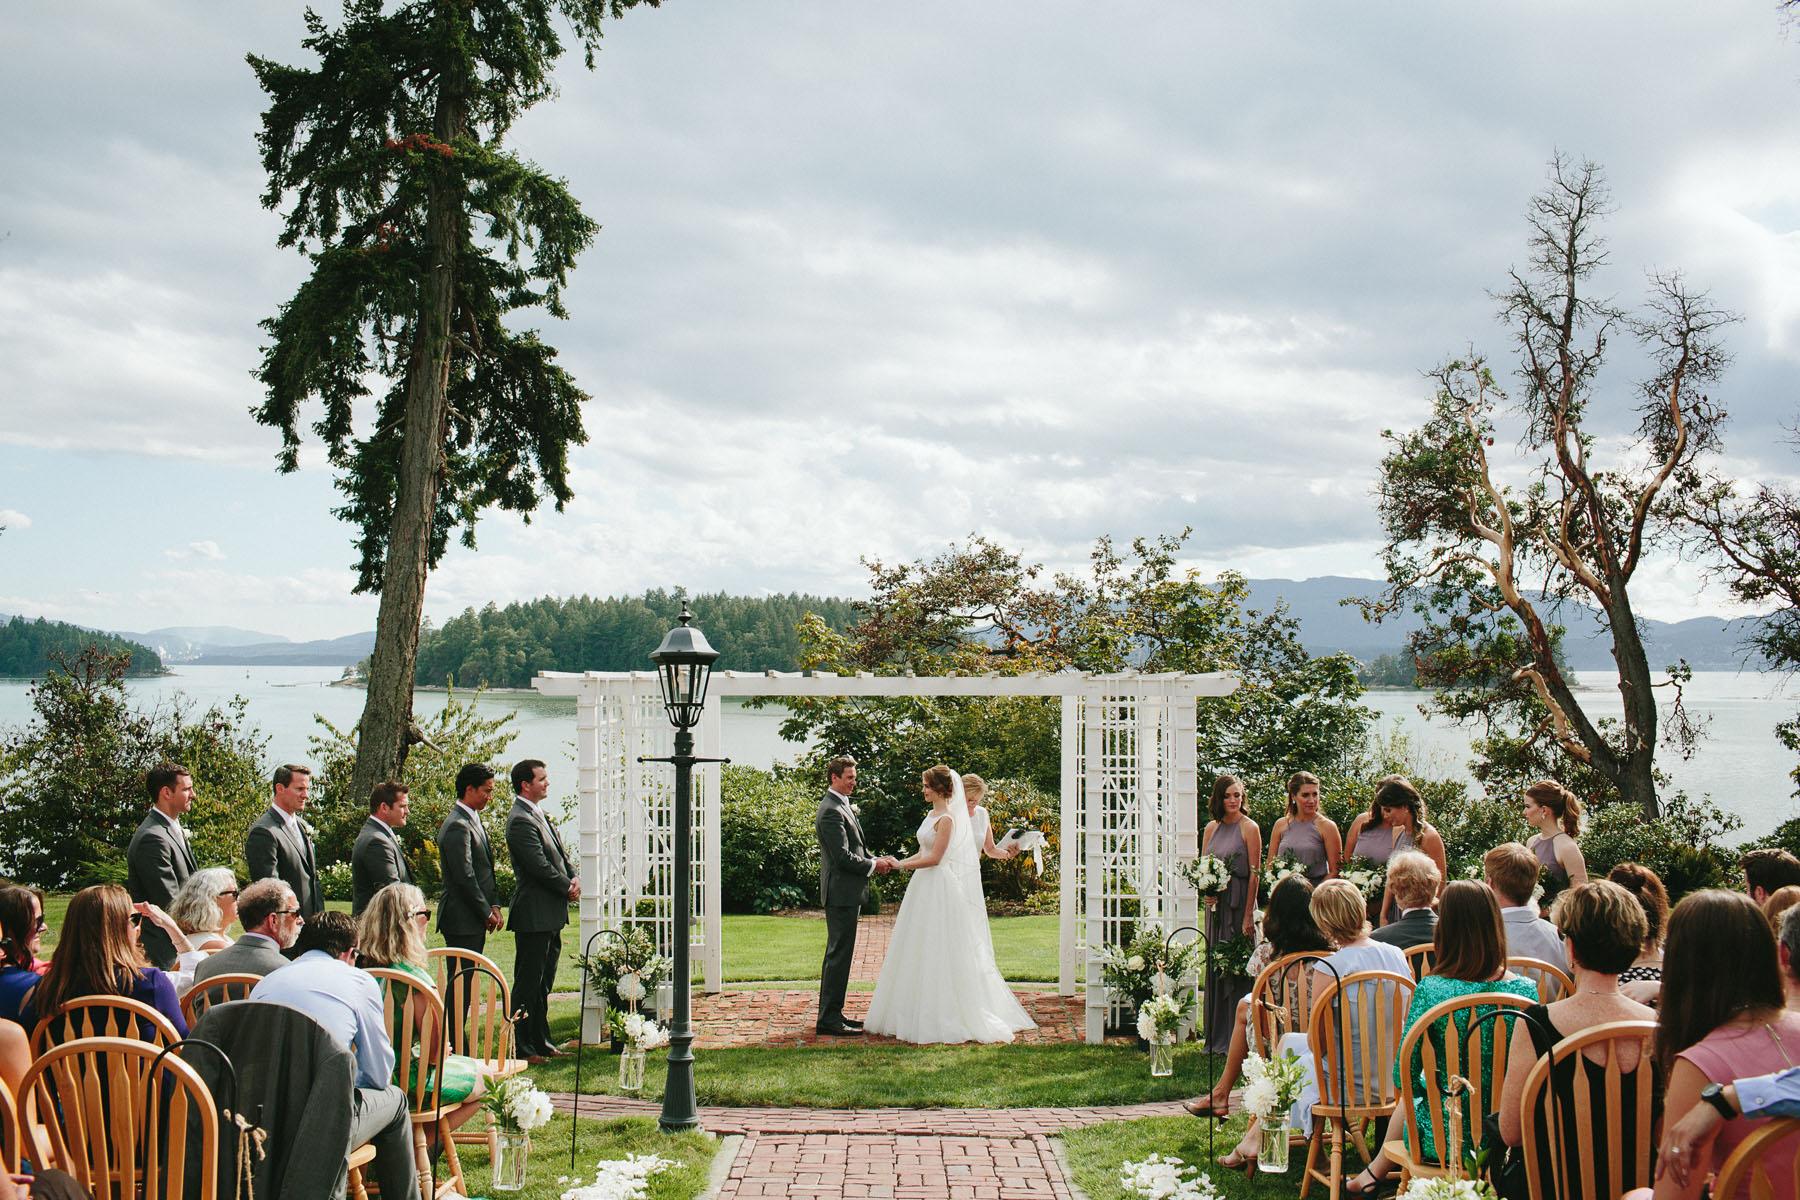 thetis-island-wedding-photographer-rp-rn-089.jpg